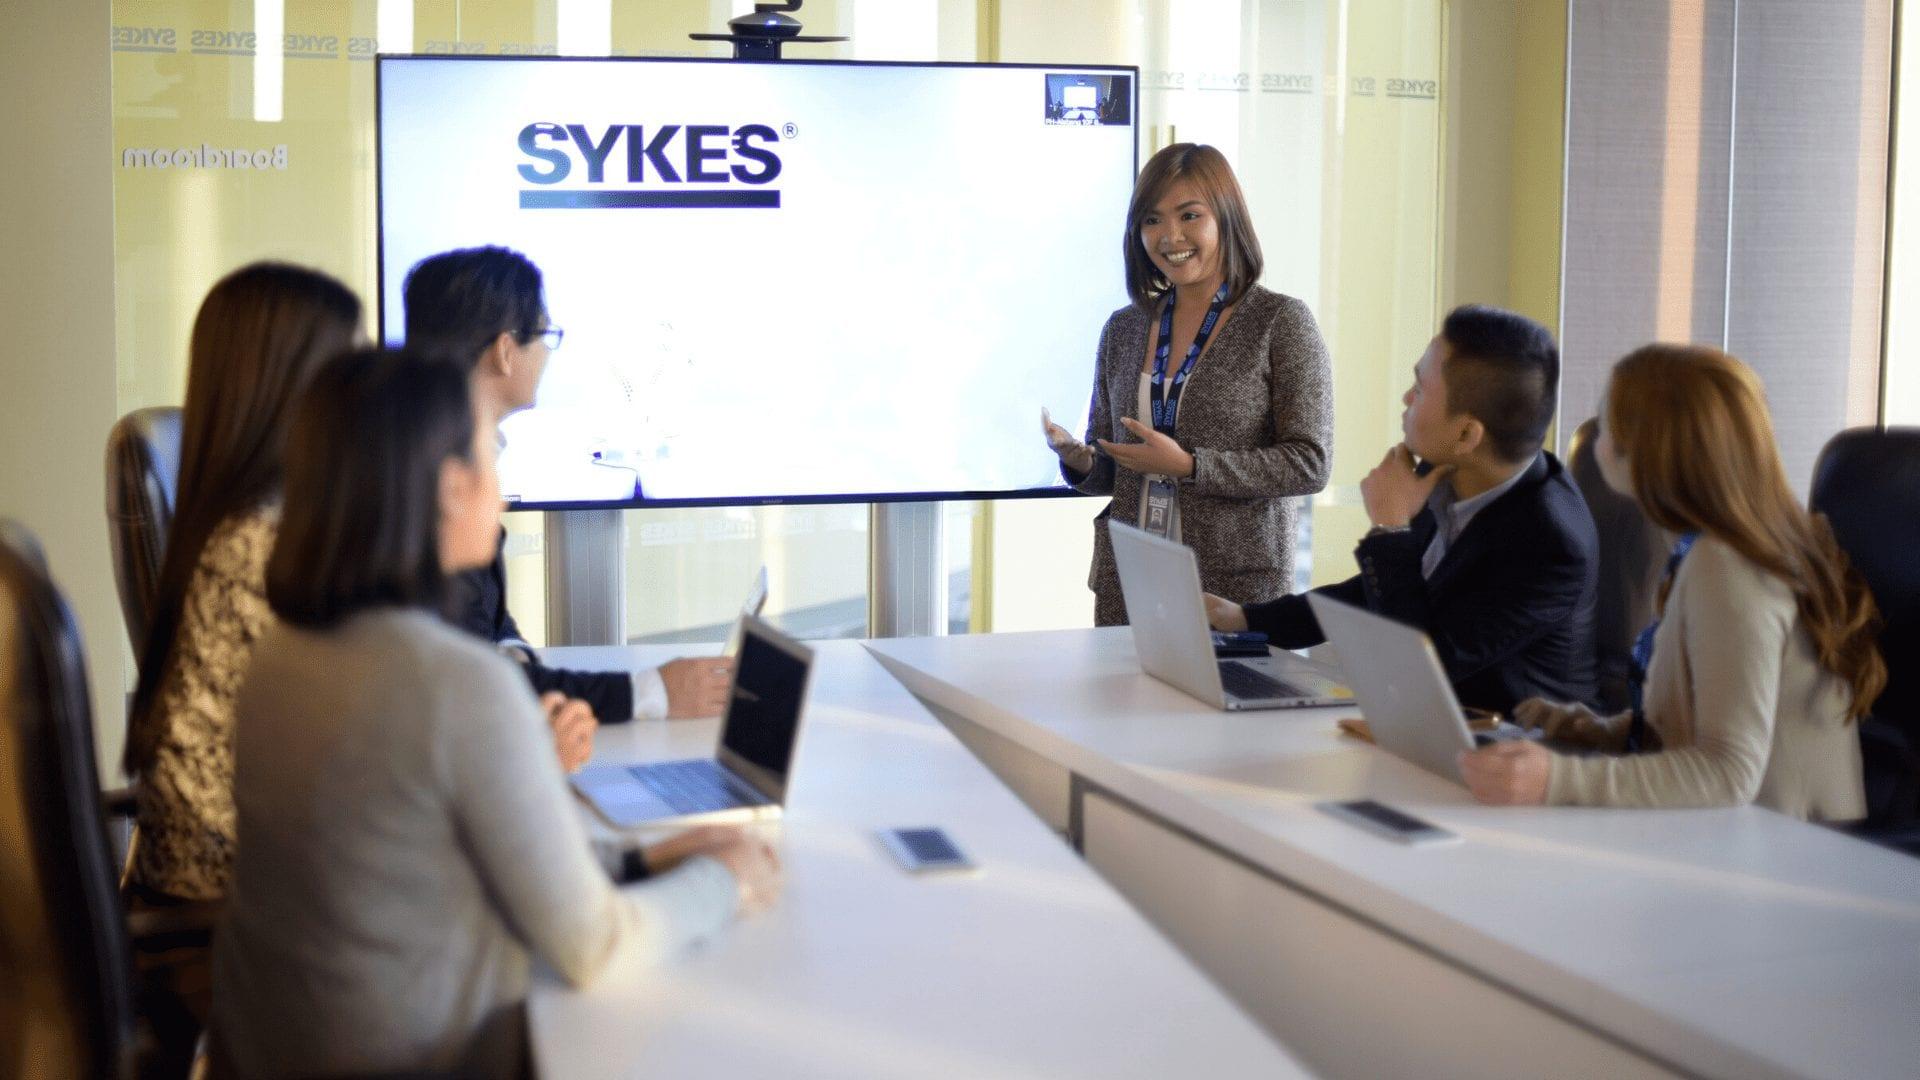 Sykes Asia